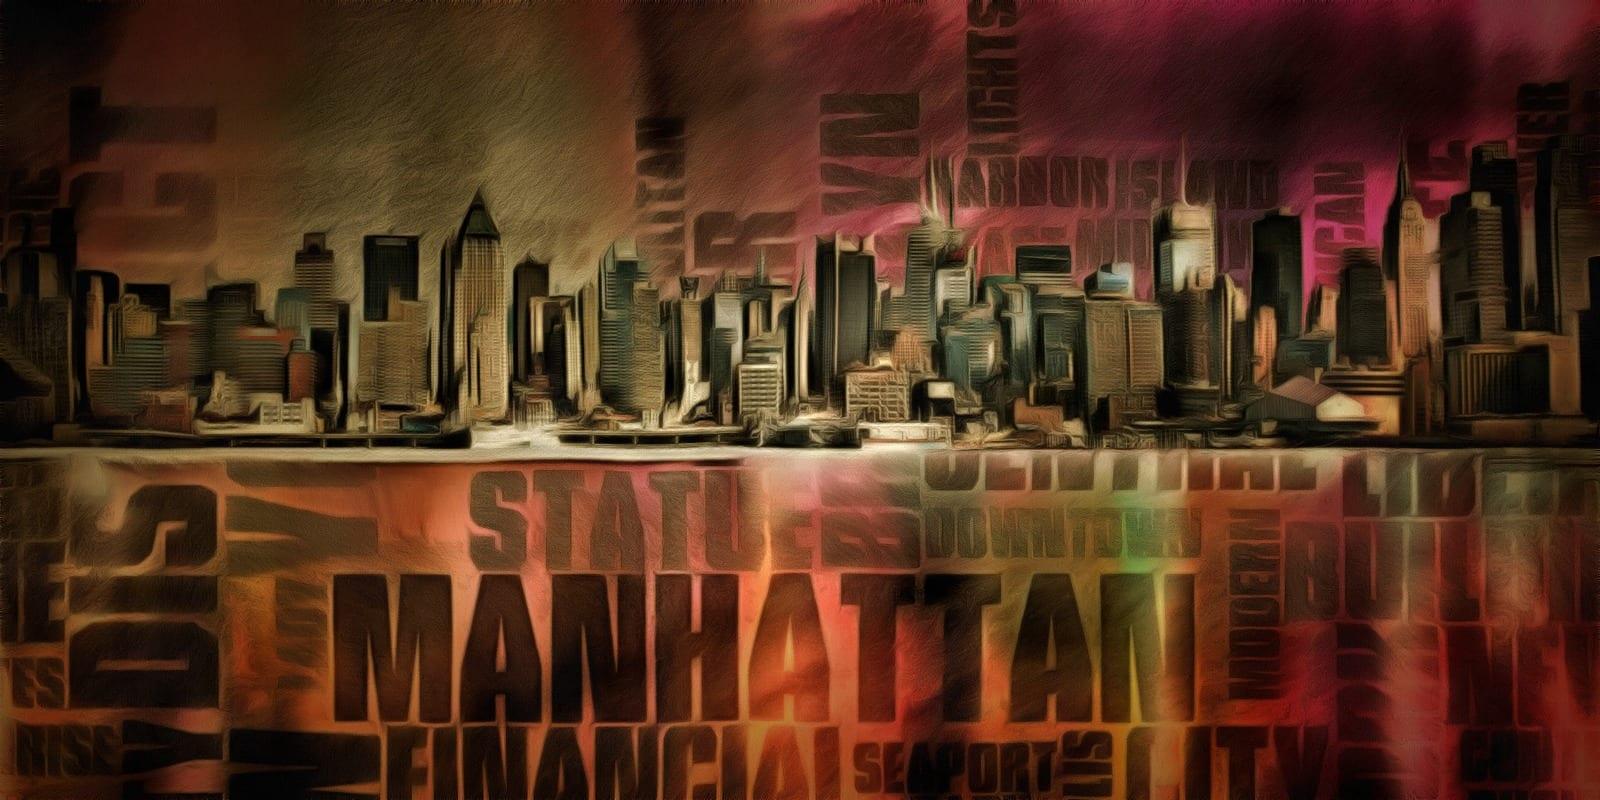 Morningside Heights Manhattan, NY Private Investigator